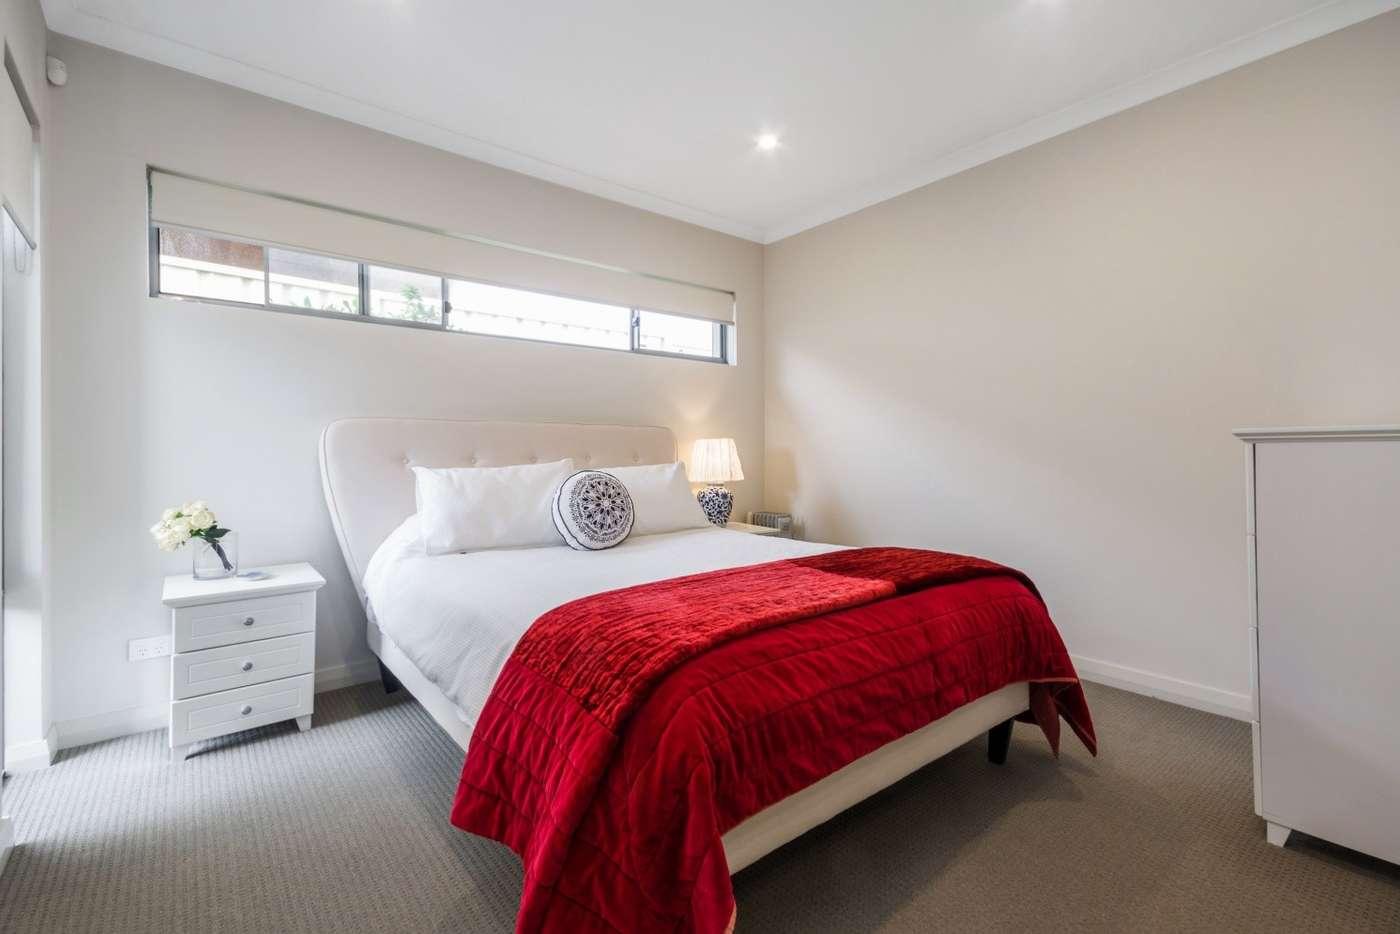 Sixth view of Homely house listing, 49C Hillsborough Drive, Nollamara WA 6061